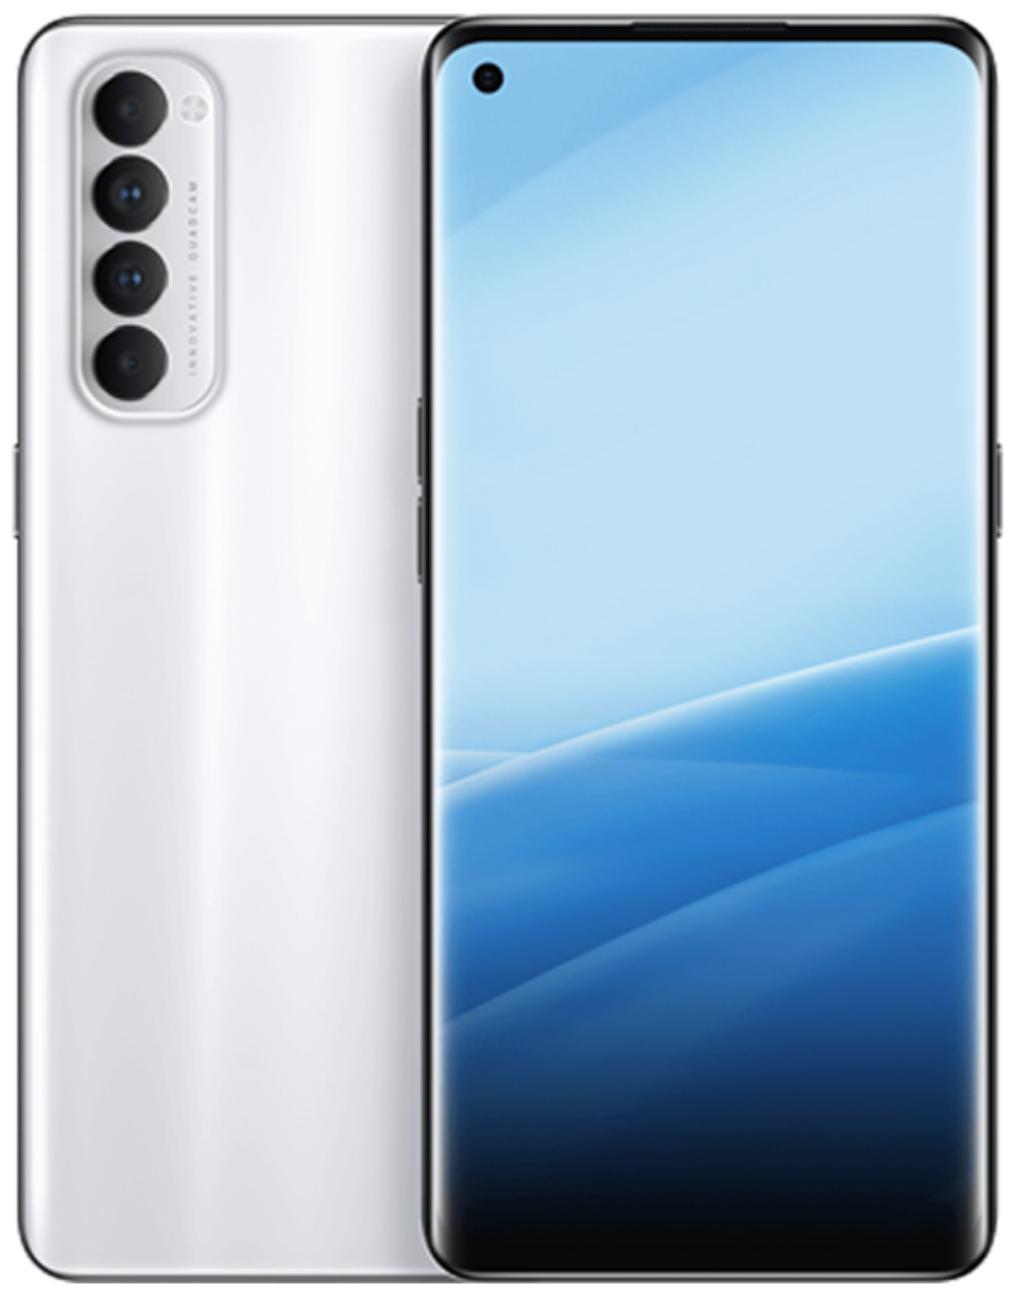 OPPO Reno 4 Pro CPH2109 Dual Sim 256GB White (8GB RAM)